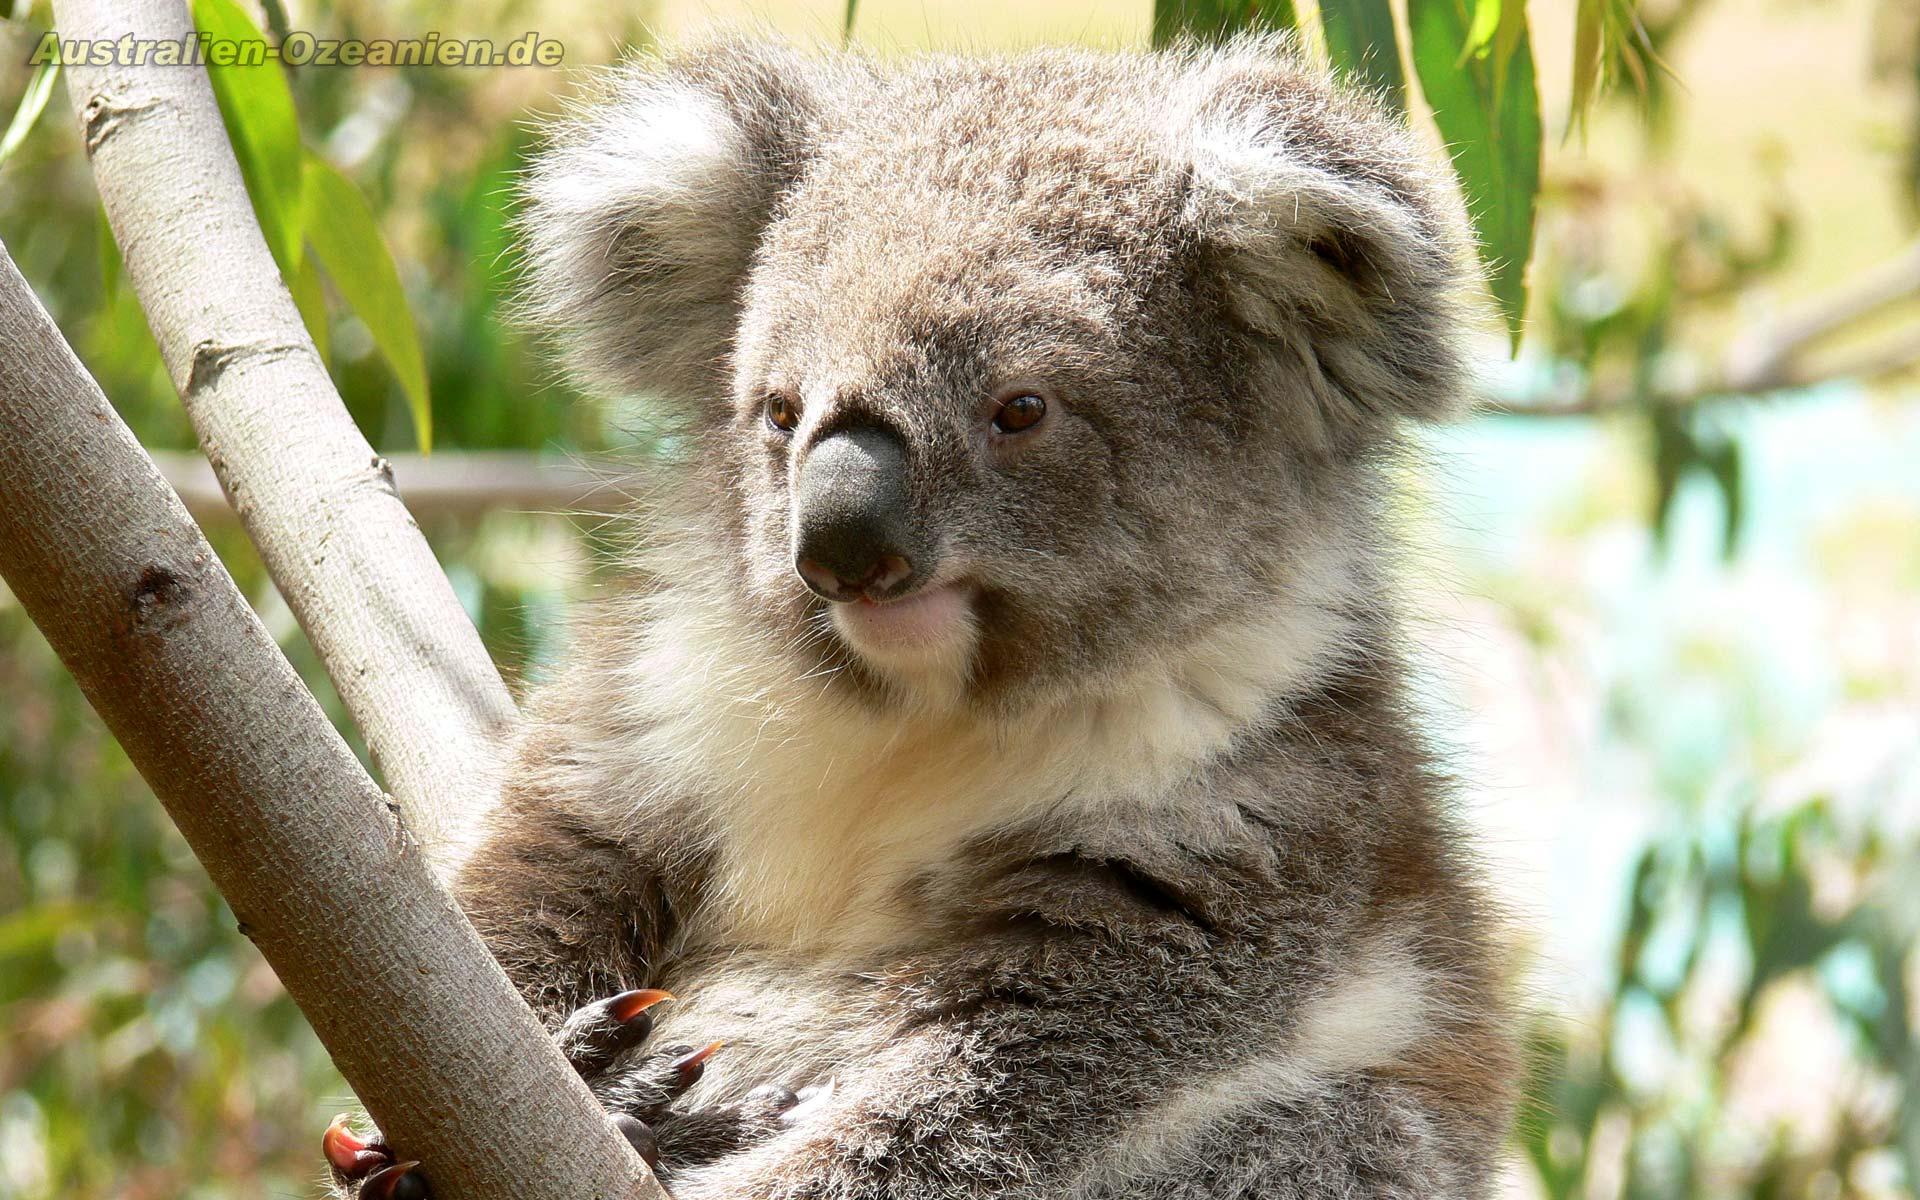 Koala wallpaper - 131204